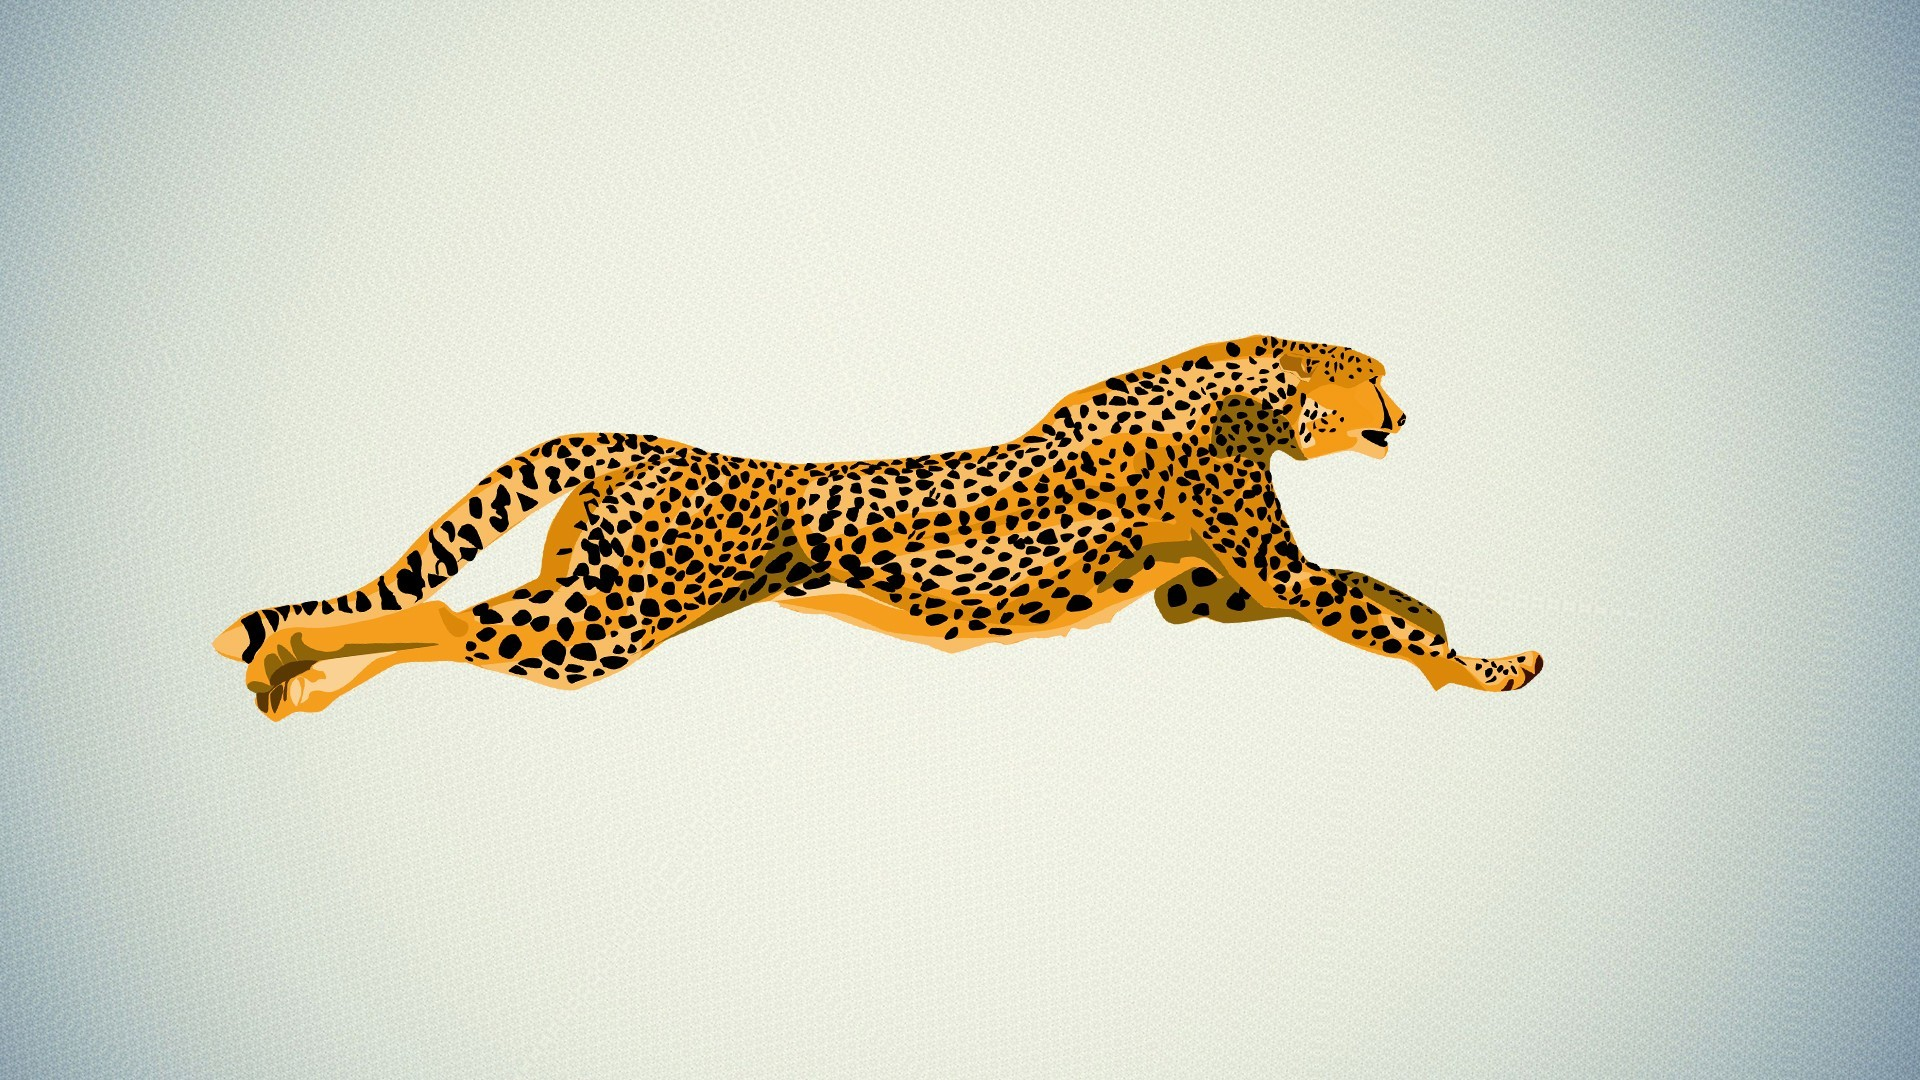 Res: 1920x1080, Cheetah Wallpapers HQ 29037